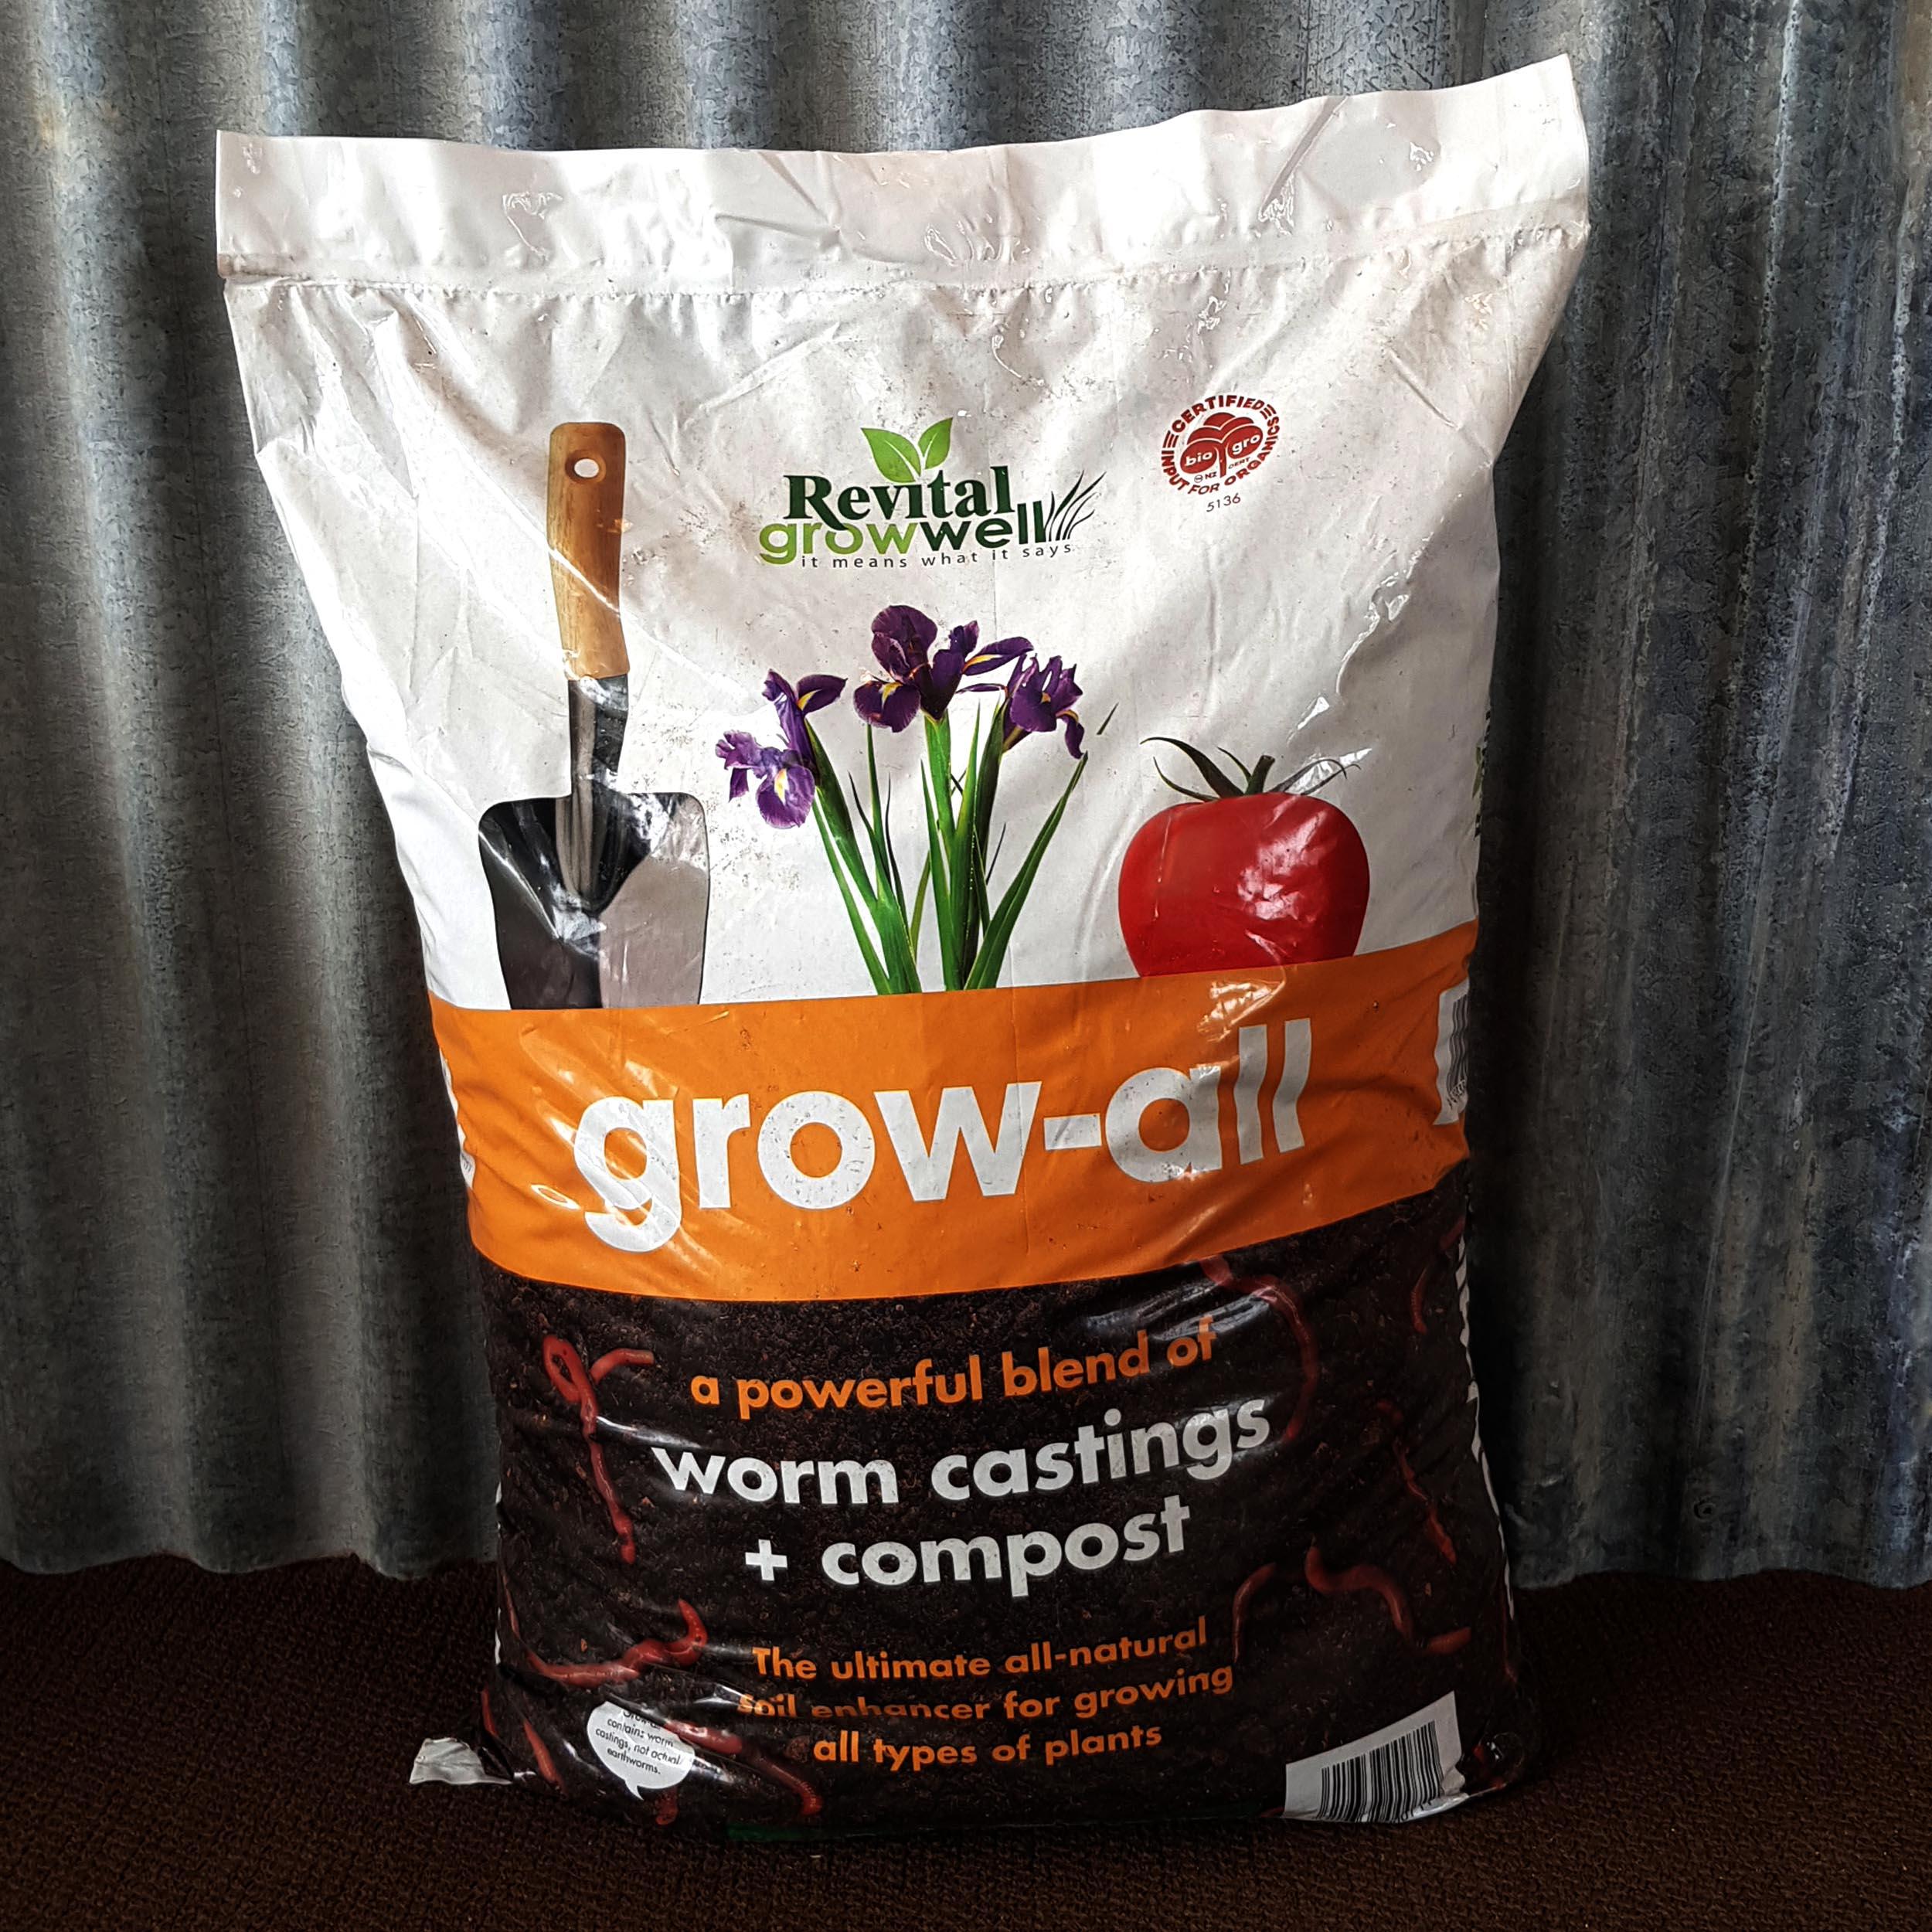 Revital Worm Castings & Compost